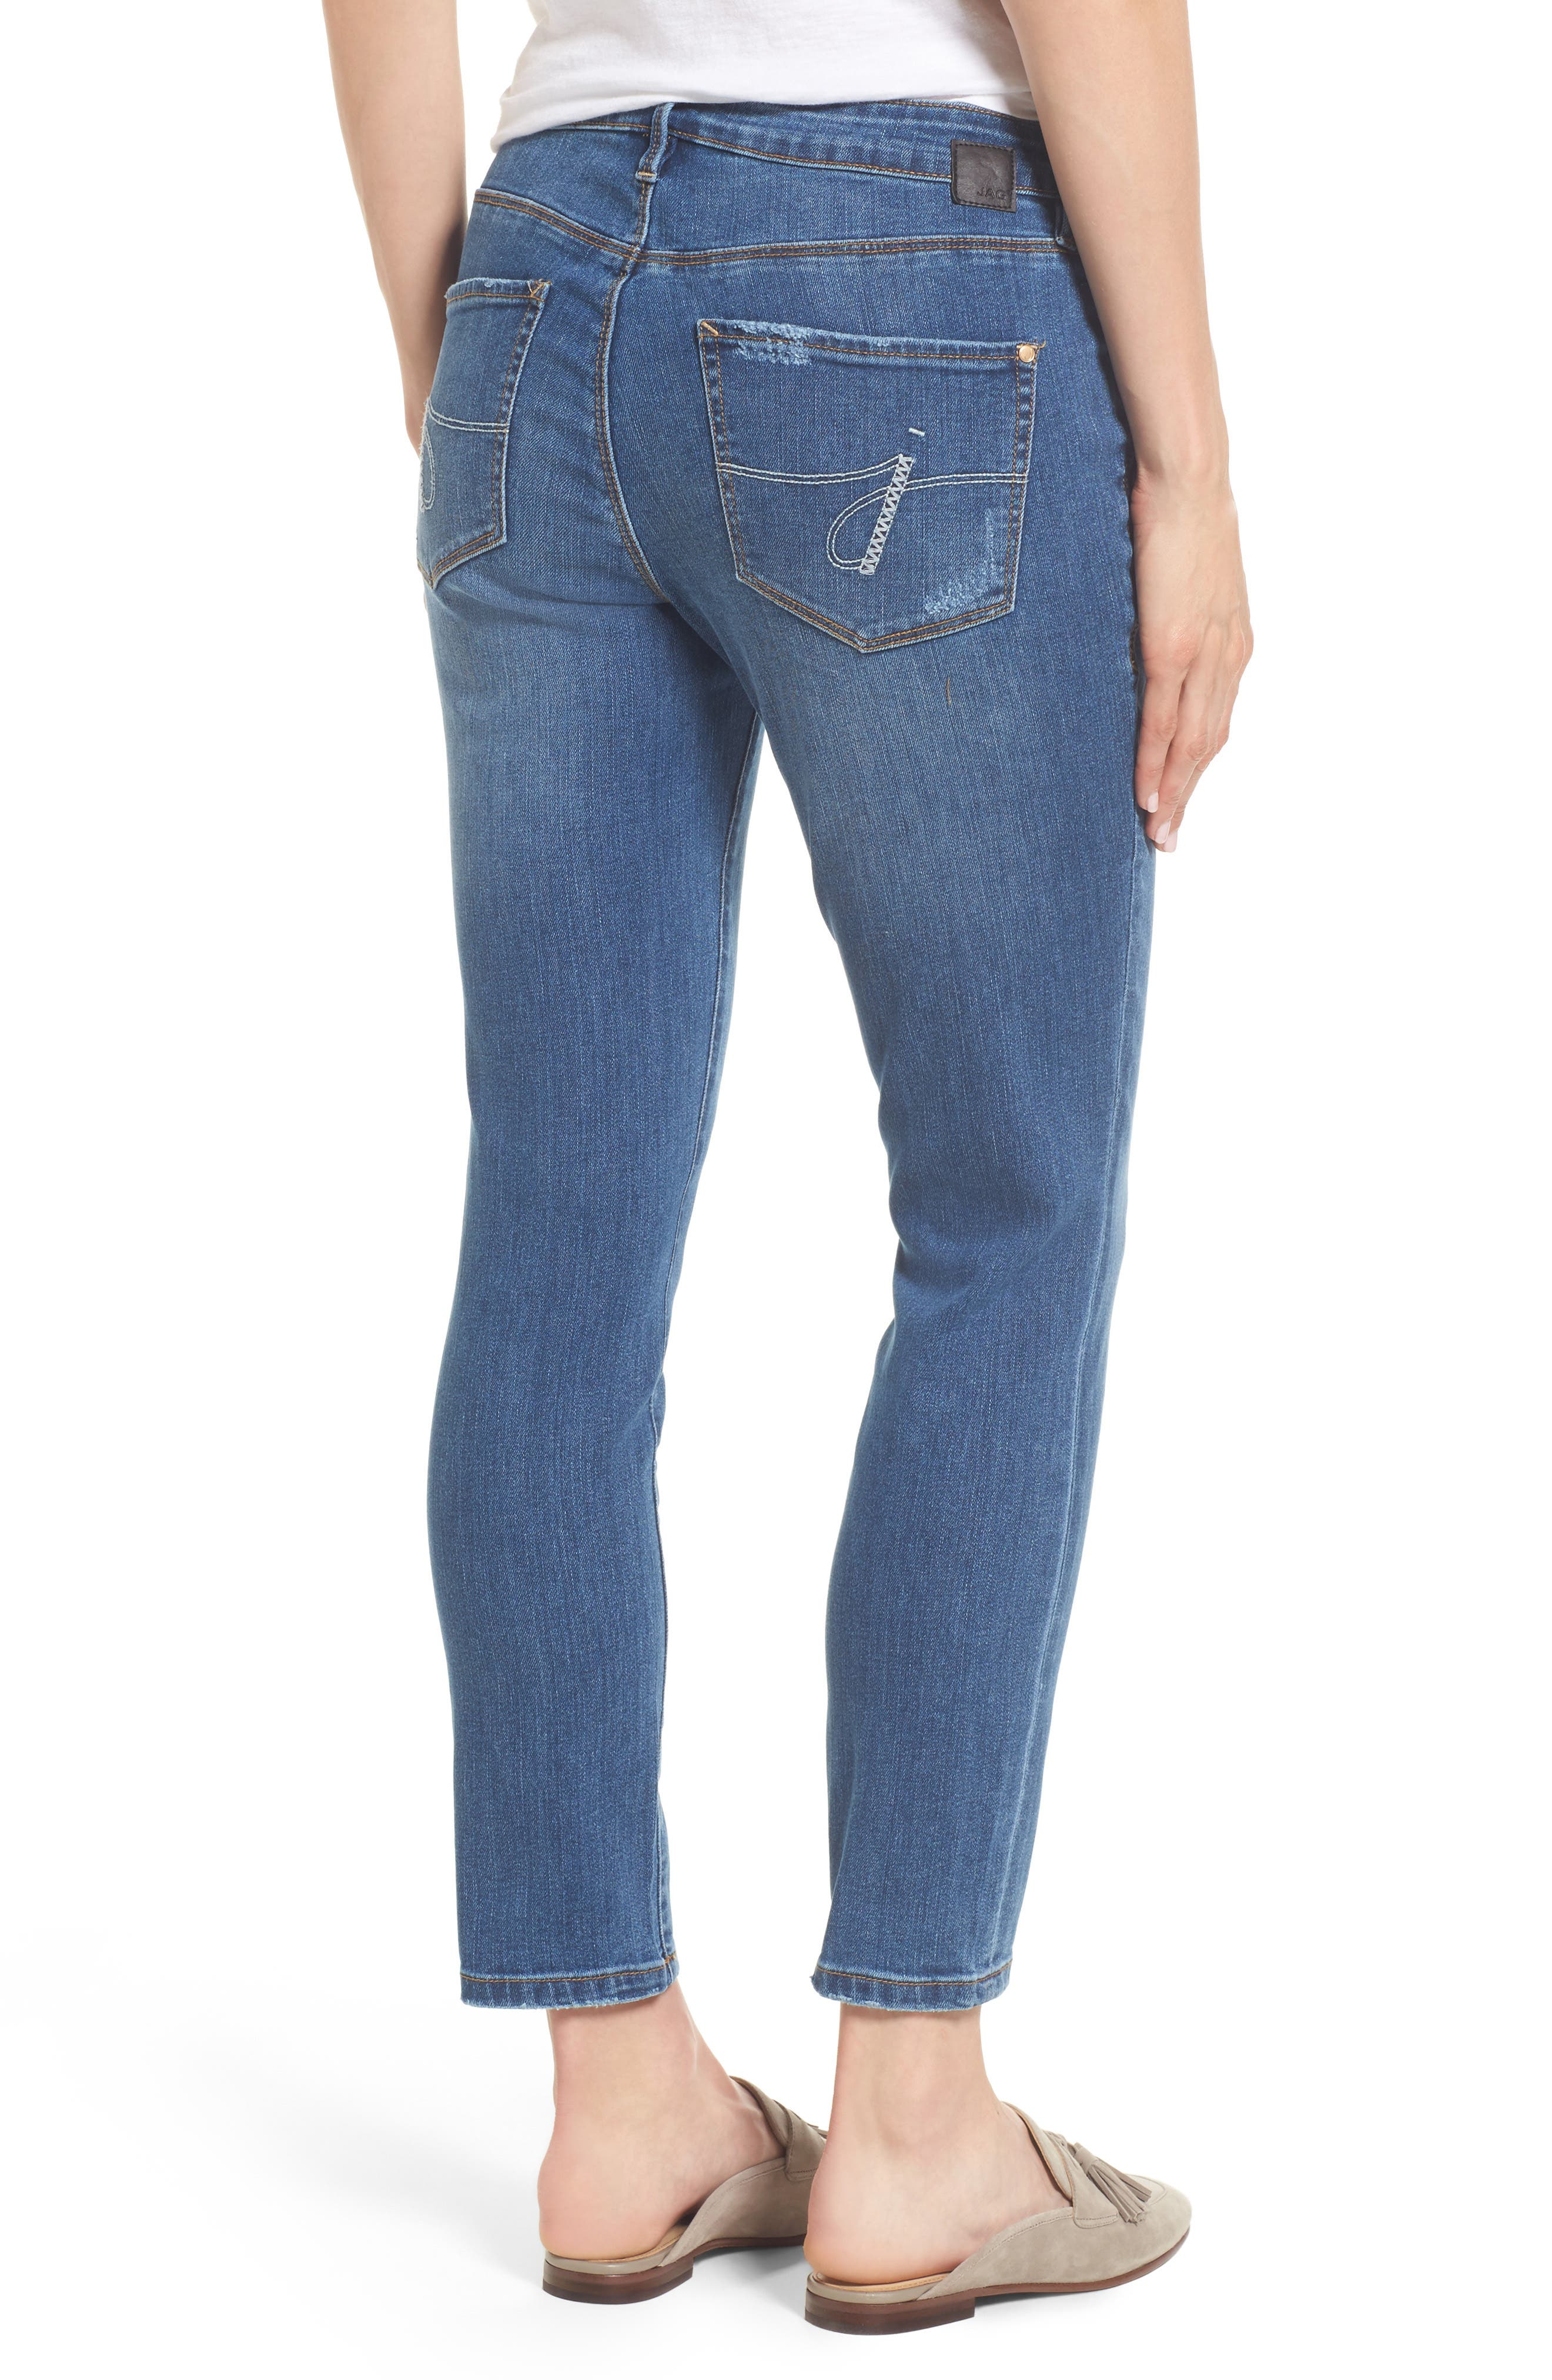 Mera Skinny Ankle Jeans,                             Alternate thumbnail 2, color,                             420